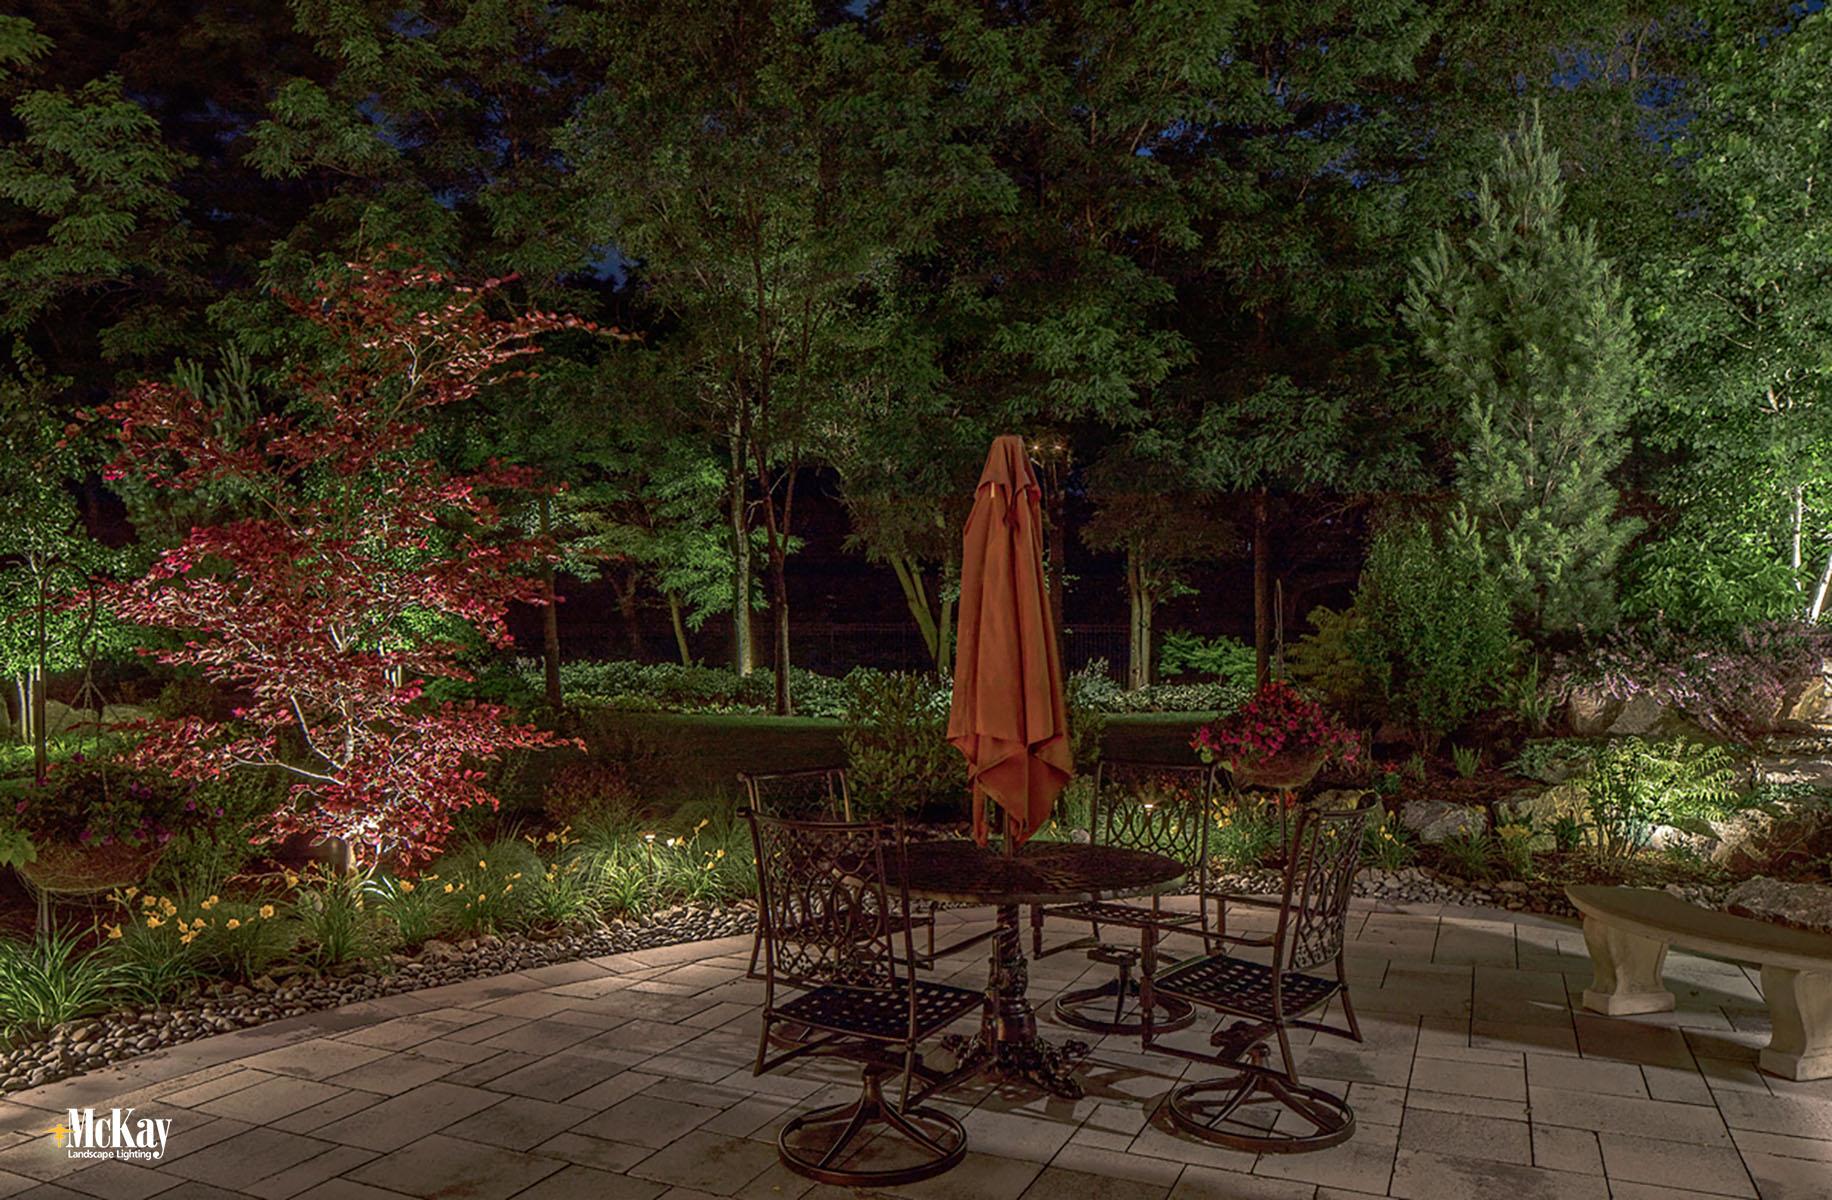 Outdoor Patio Lighting Omaha Nebraska | McKay Landscape Lighting